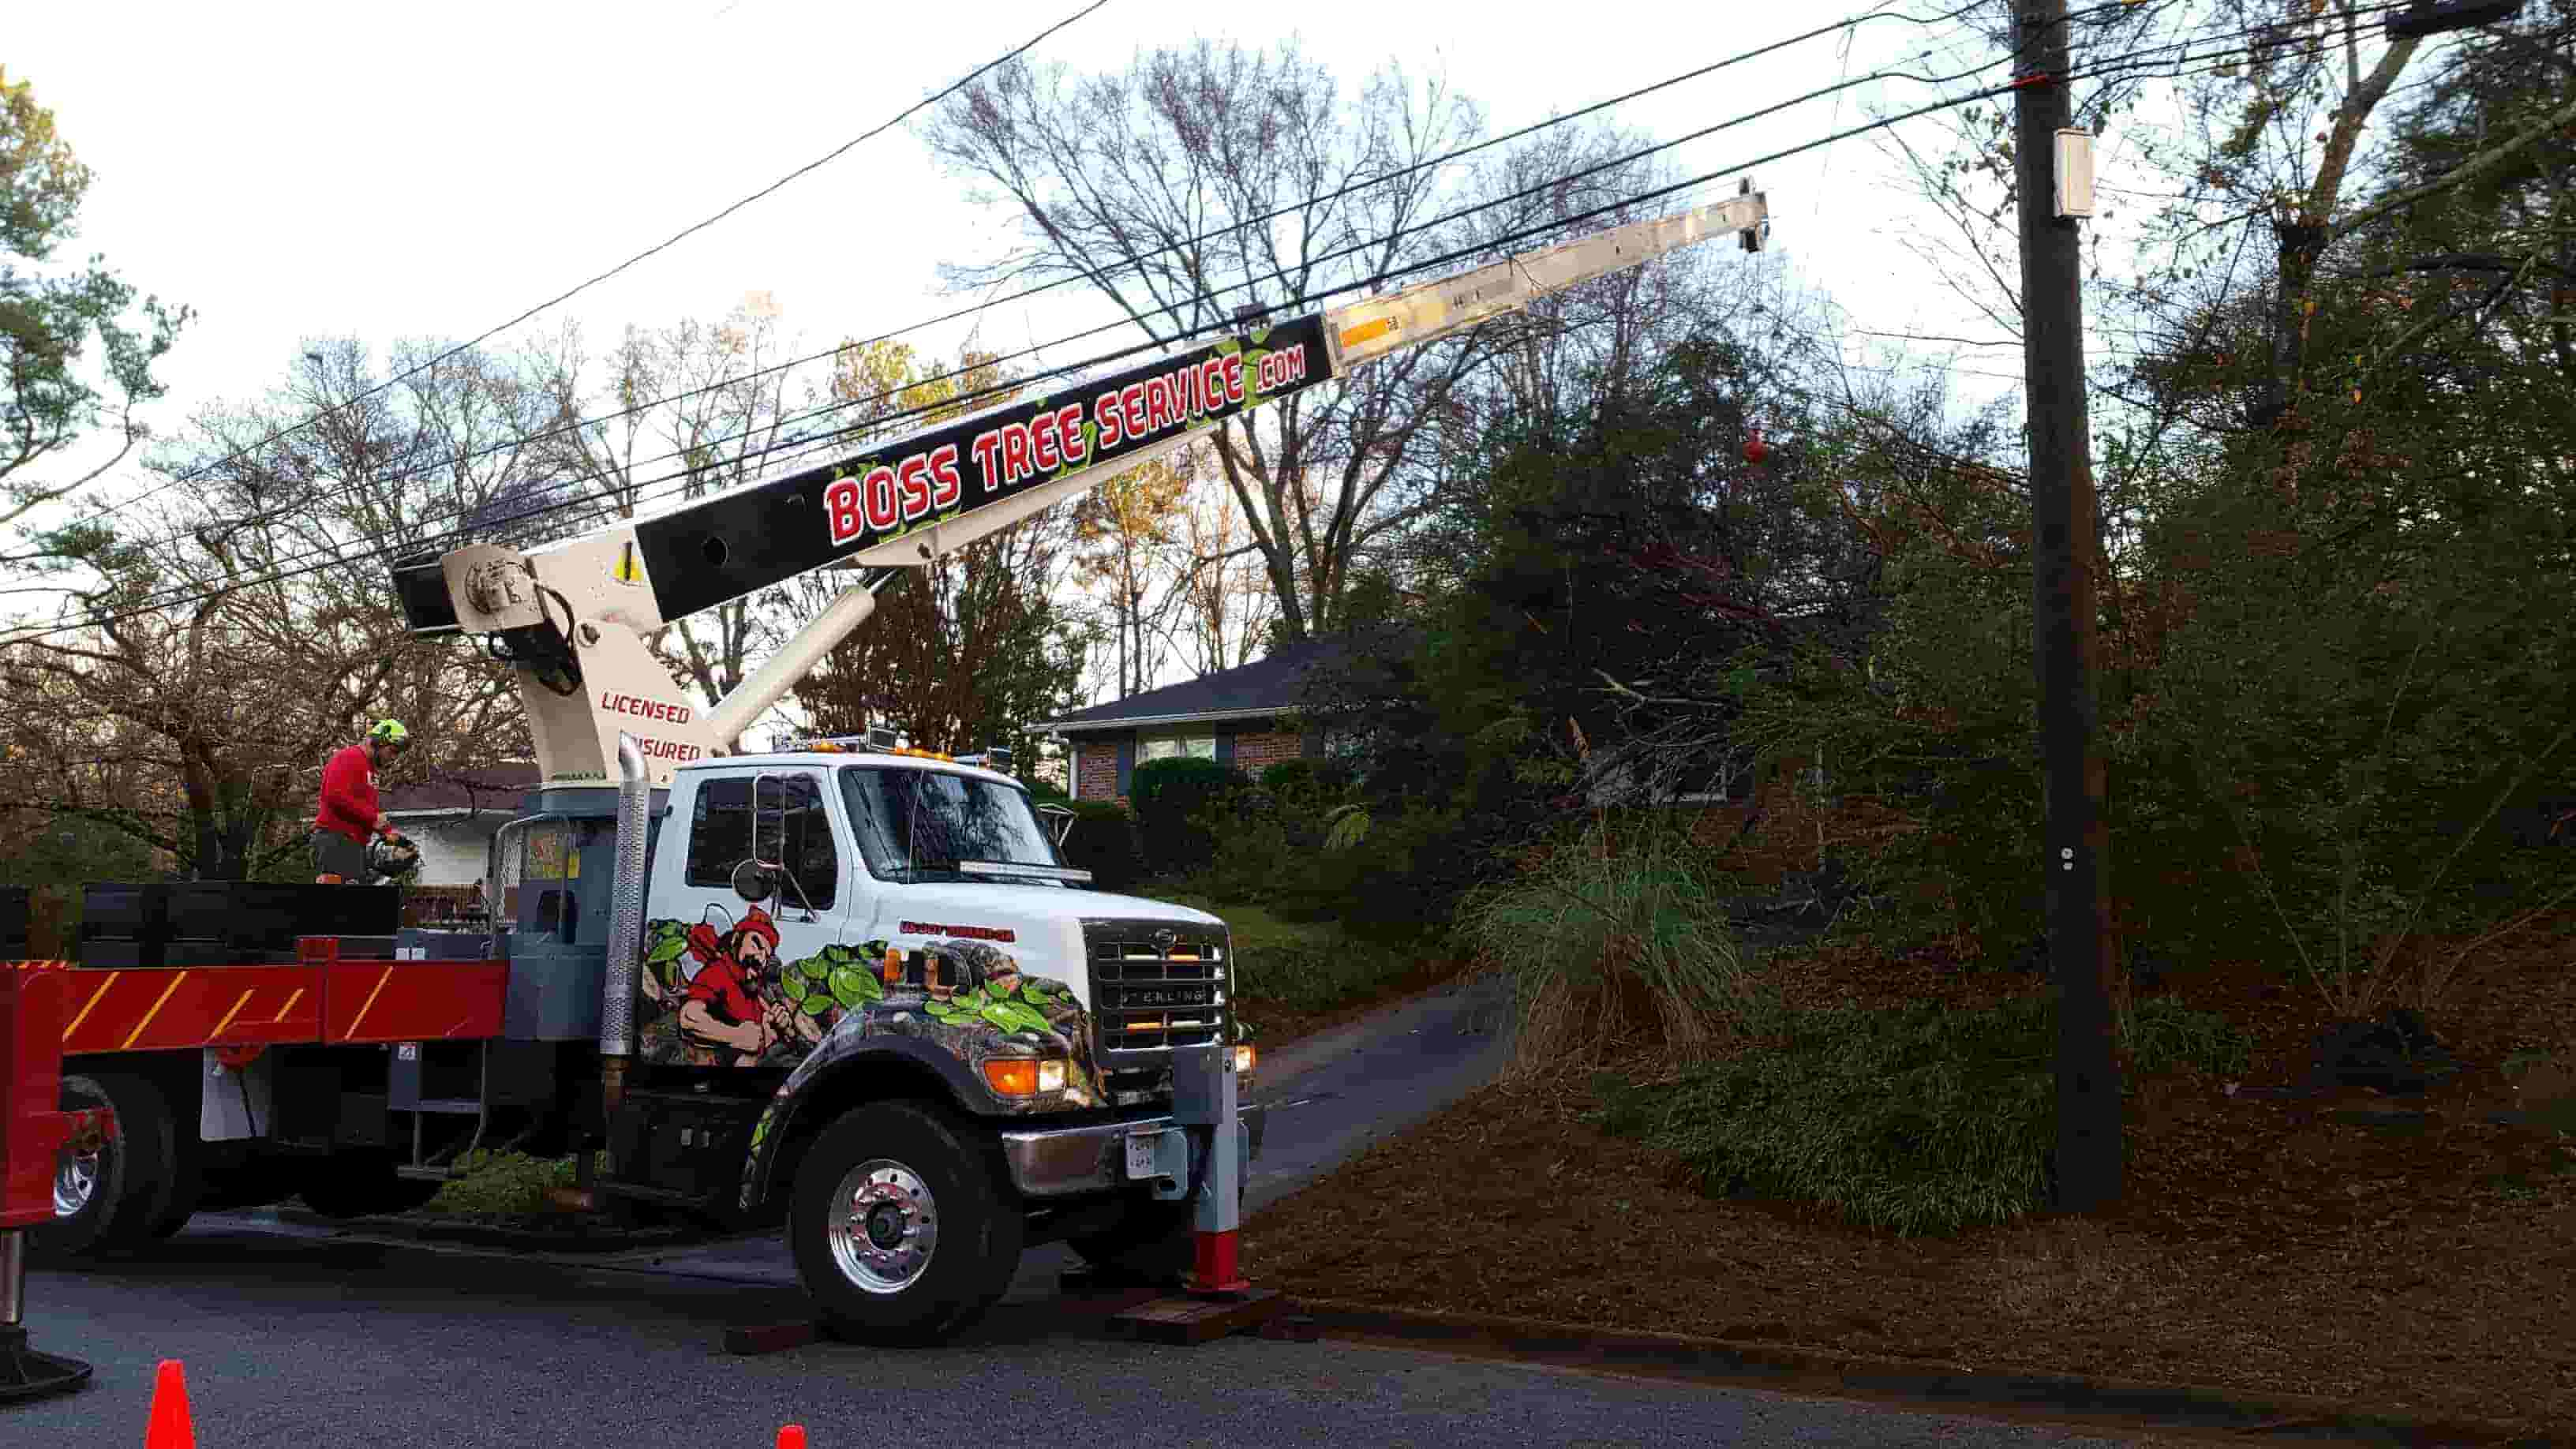 Boss Tree Service truck with crane